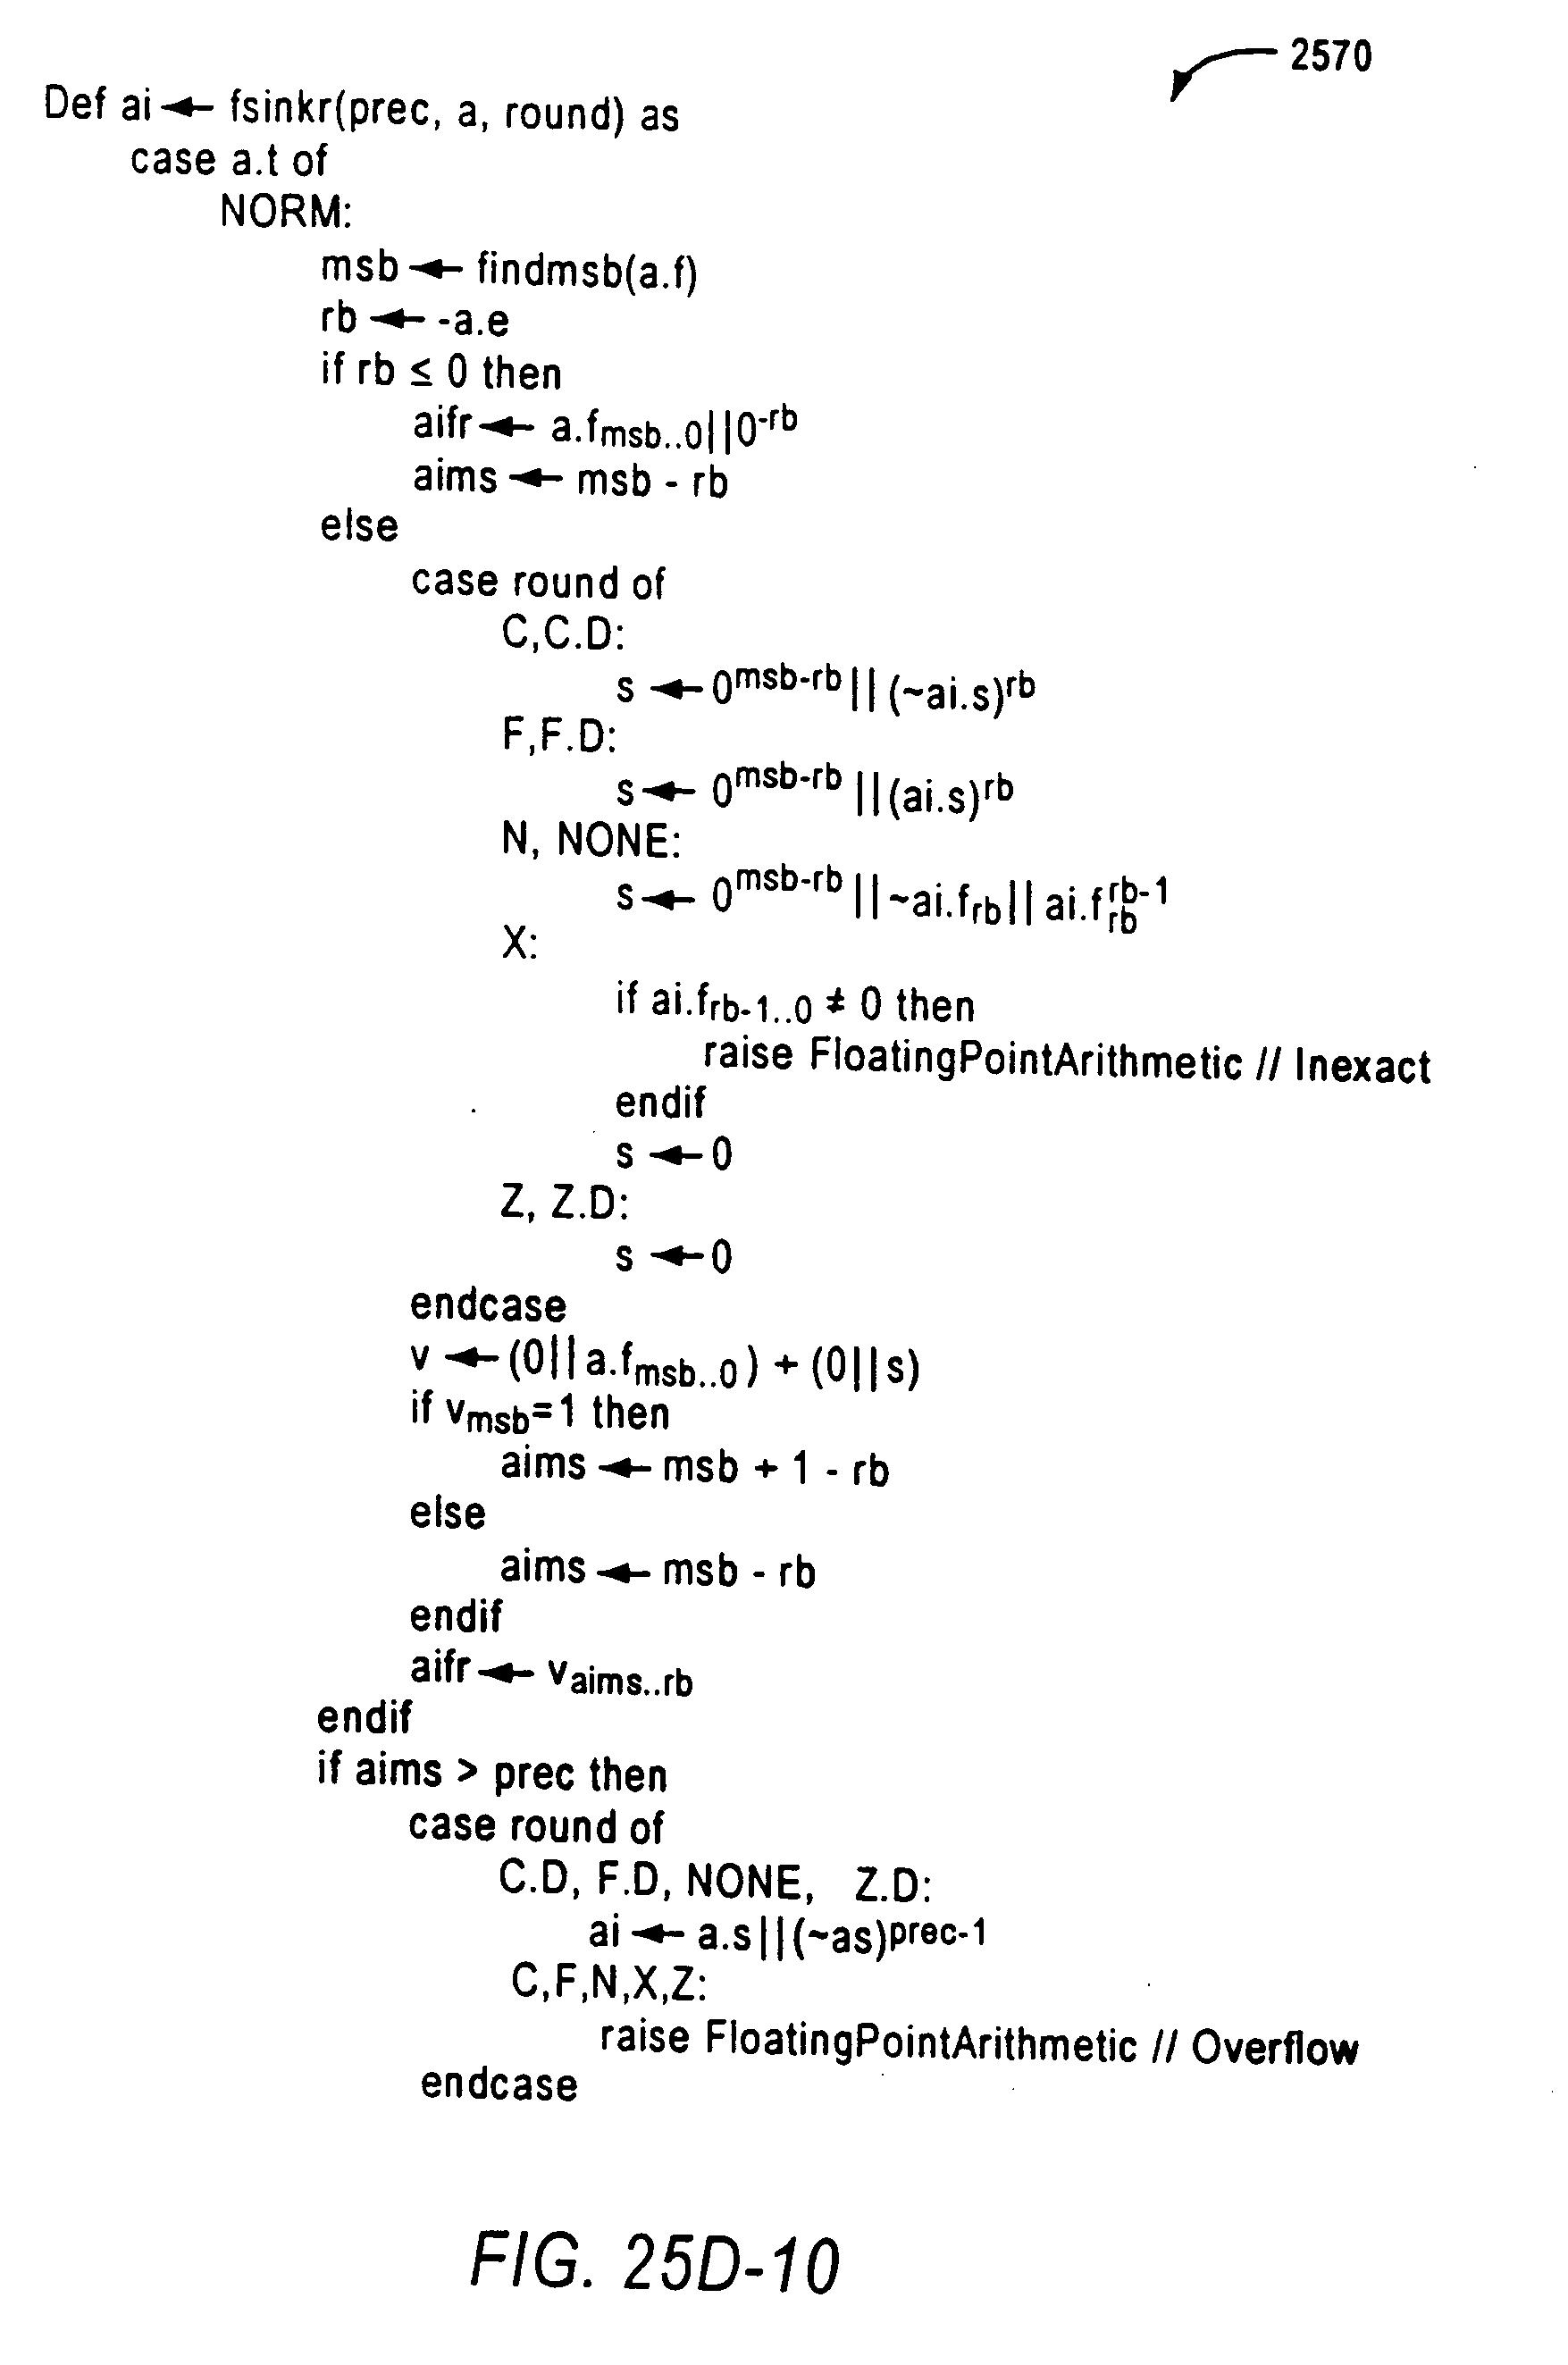 Patent US 7,301,541 B2